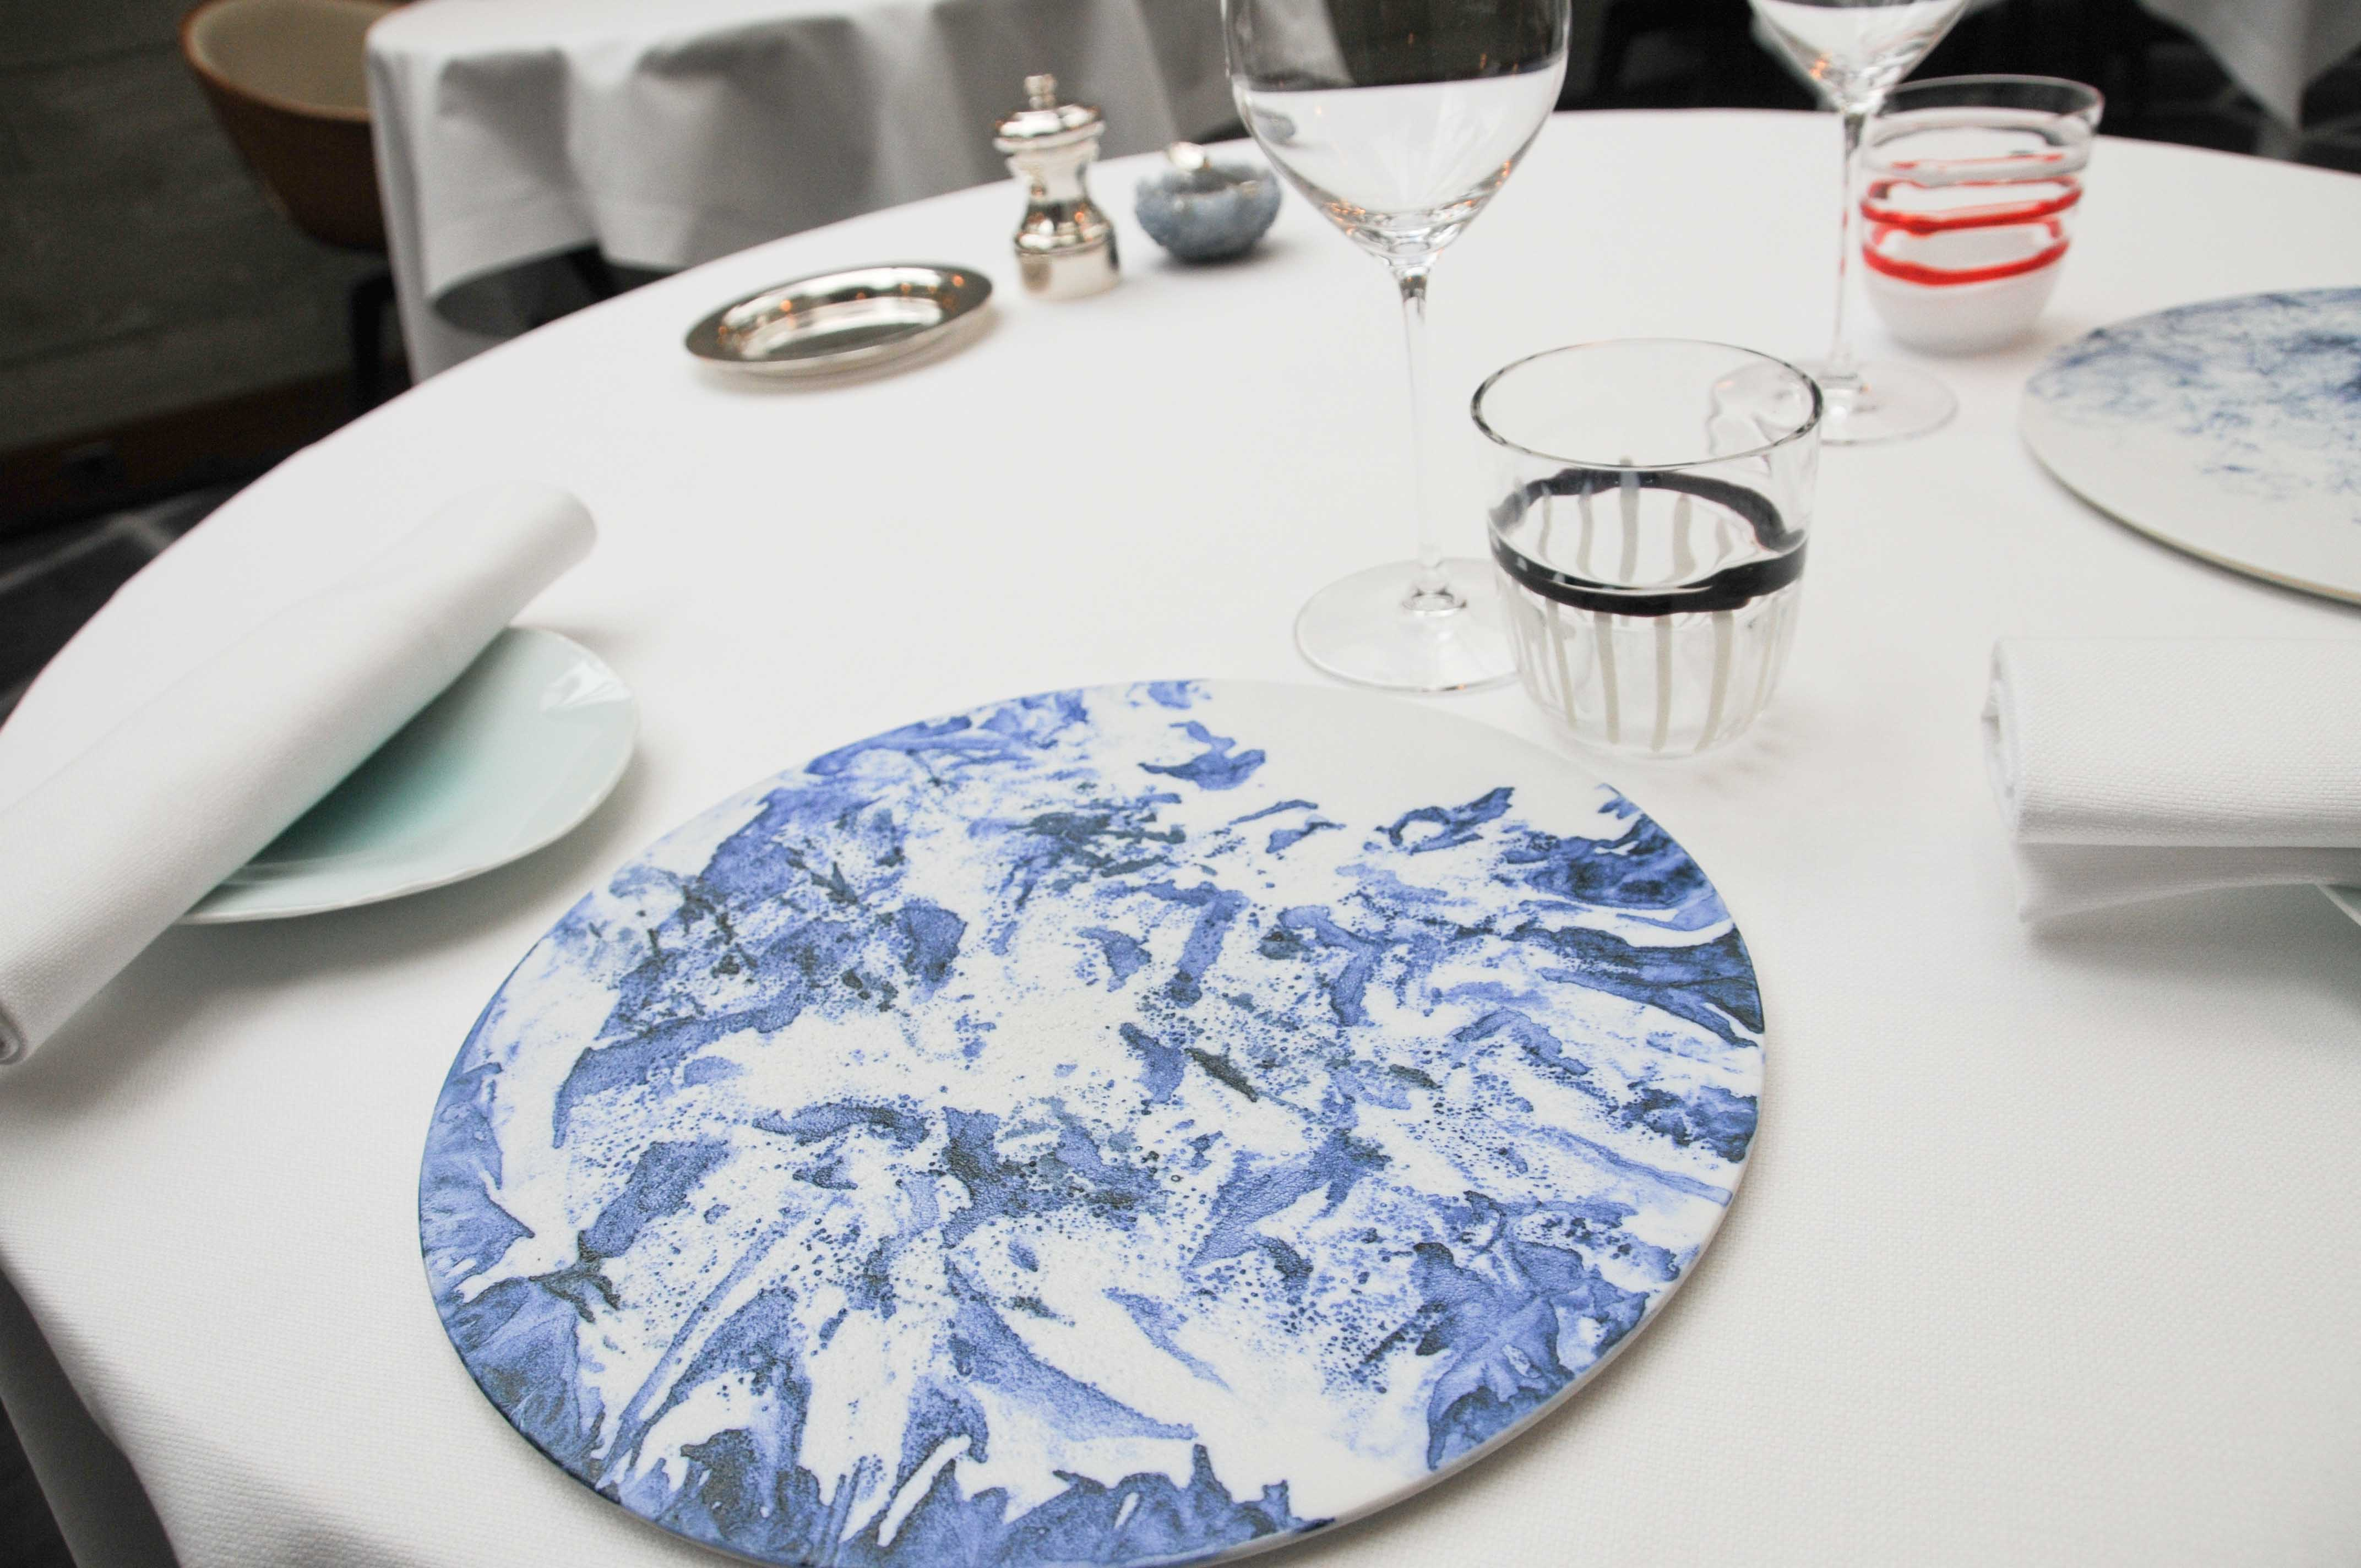 Les Prix Du Grnd Restaurant De Jean Francois Pi Ef Bf Bdge